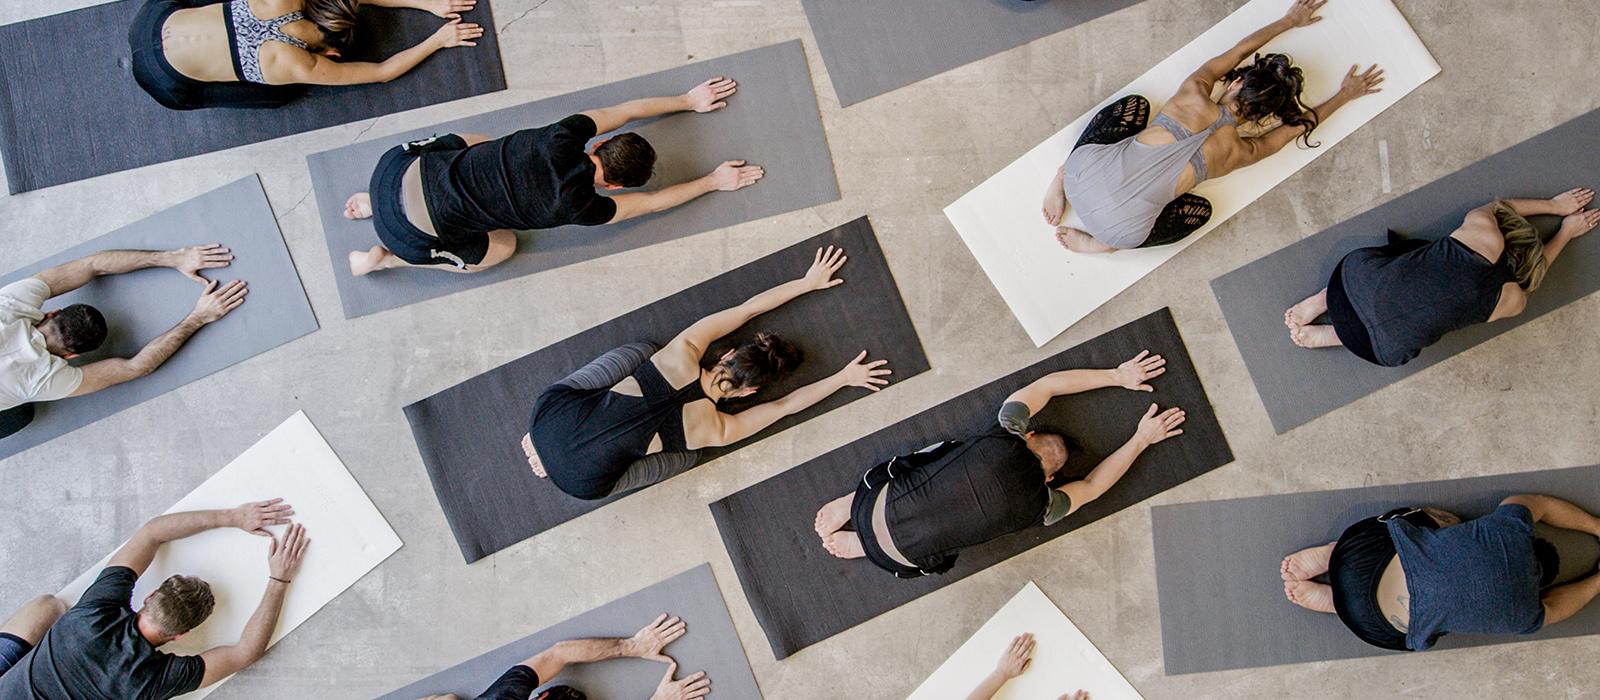 yogathankyou.jpg